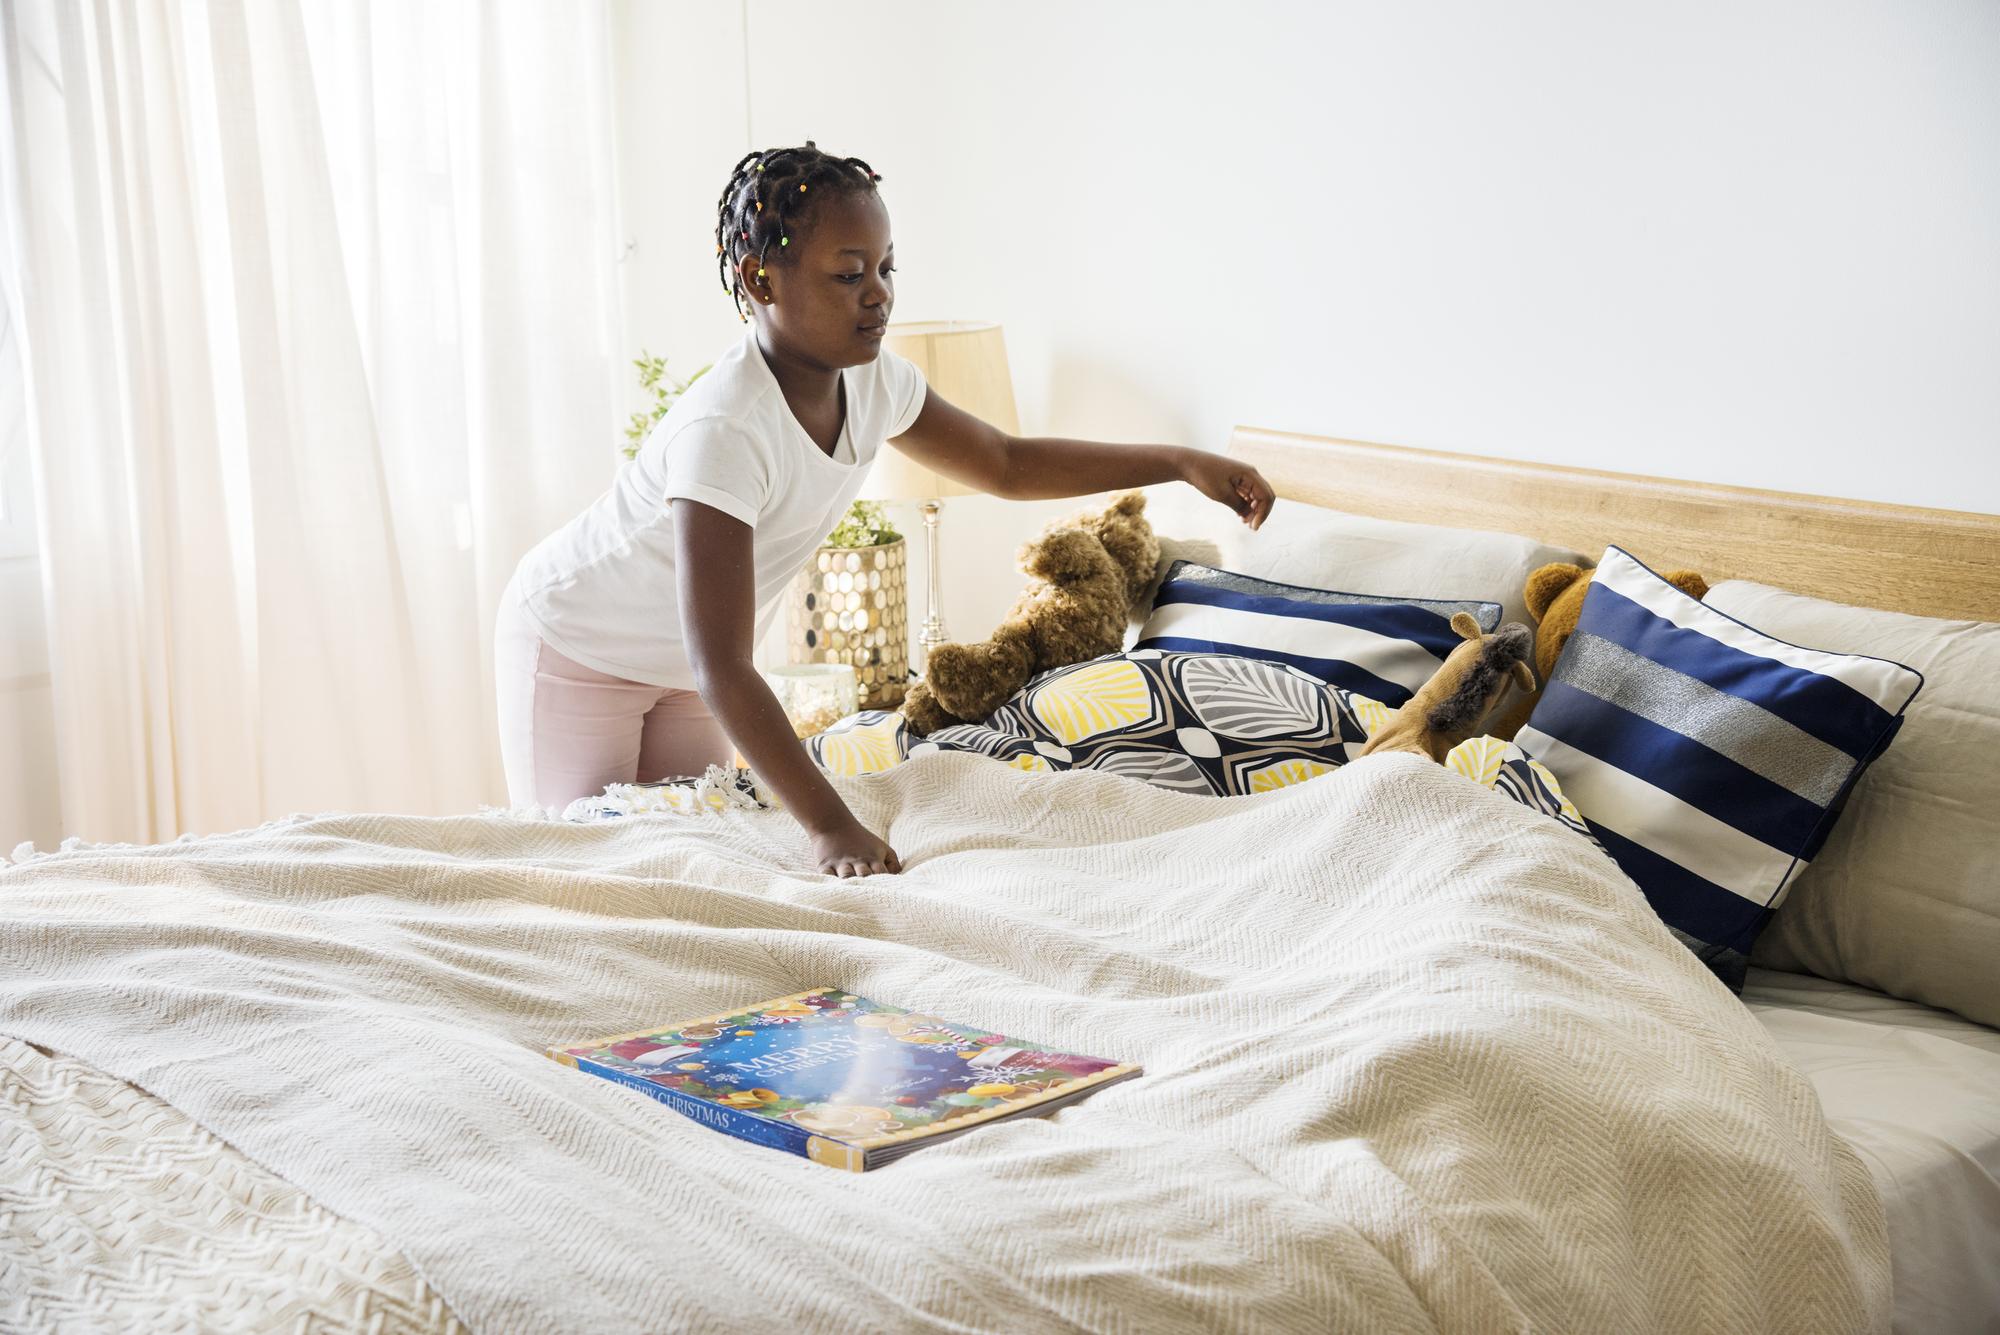 Why we make our kids do chores